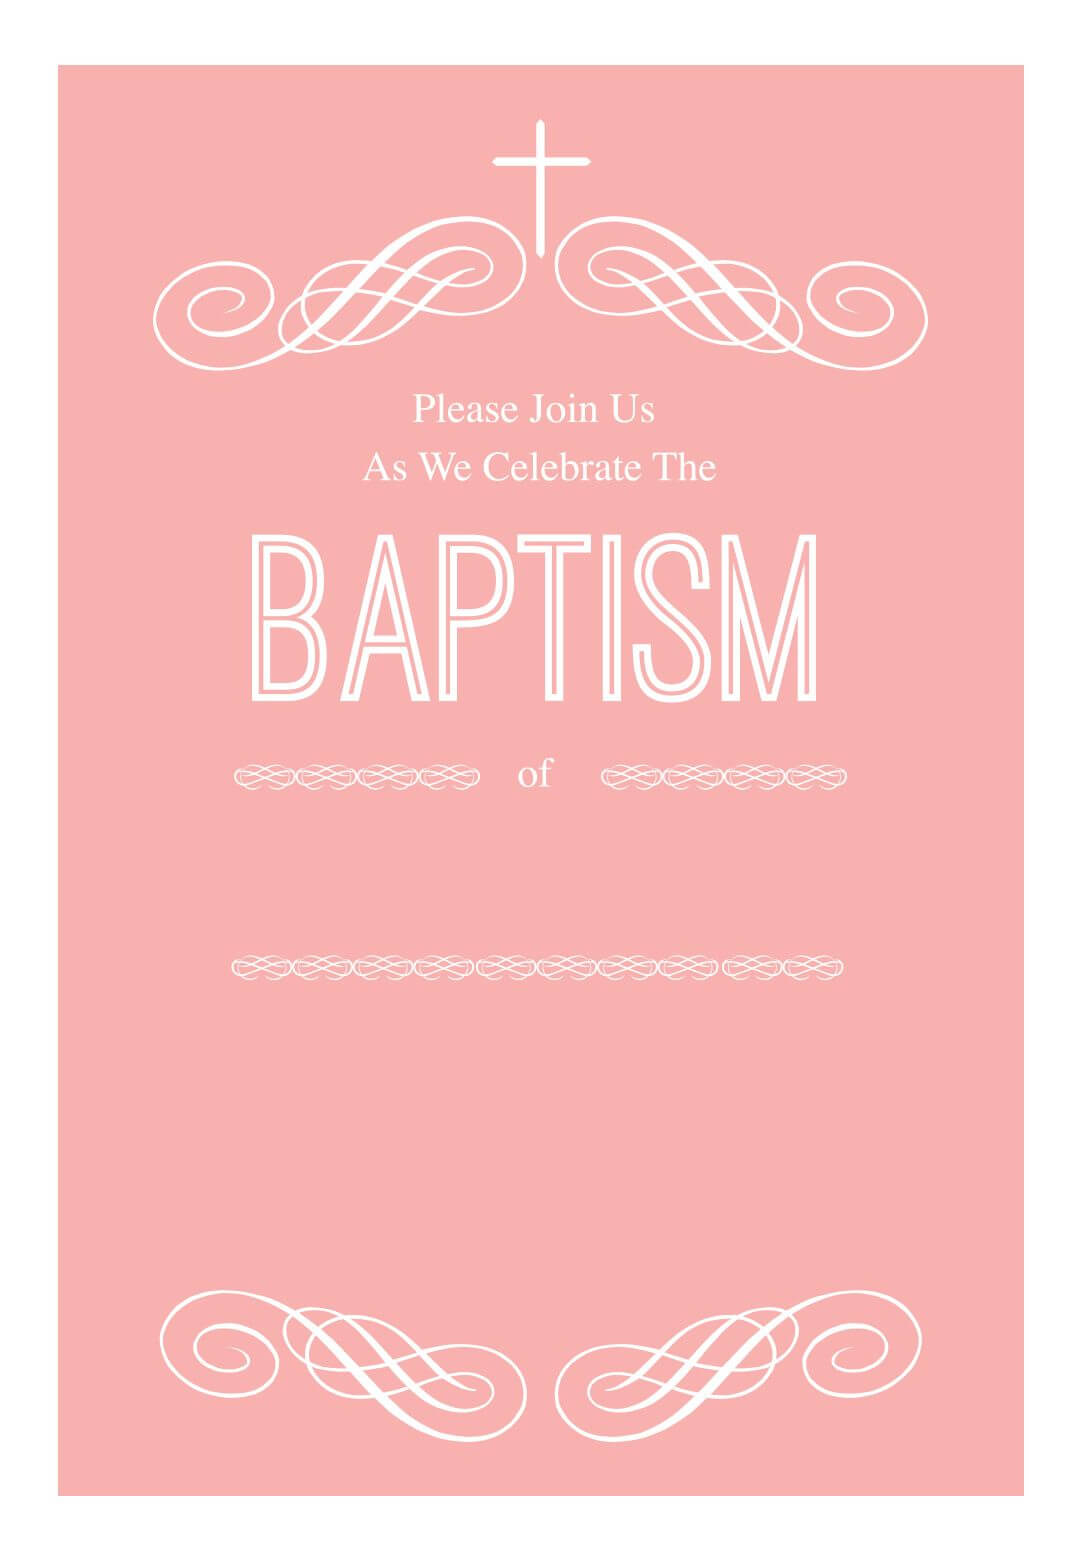 003 Template Ideas Free Baptism Invitation Templates for Blank Christening Invitation Templates